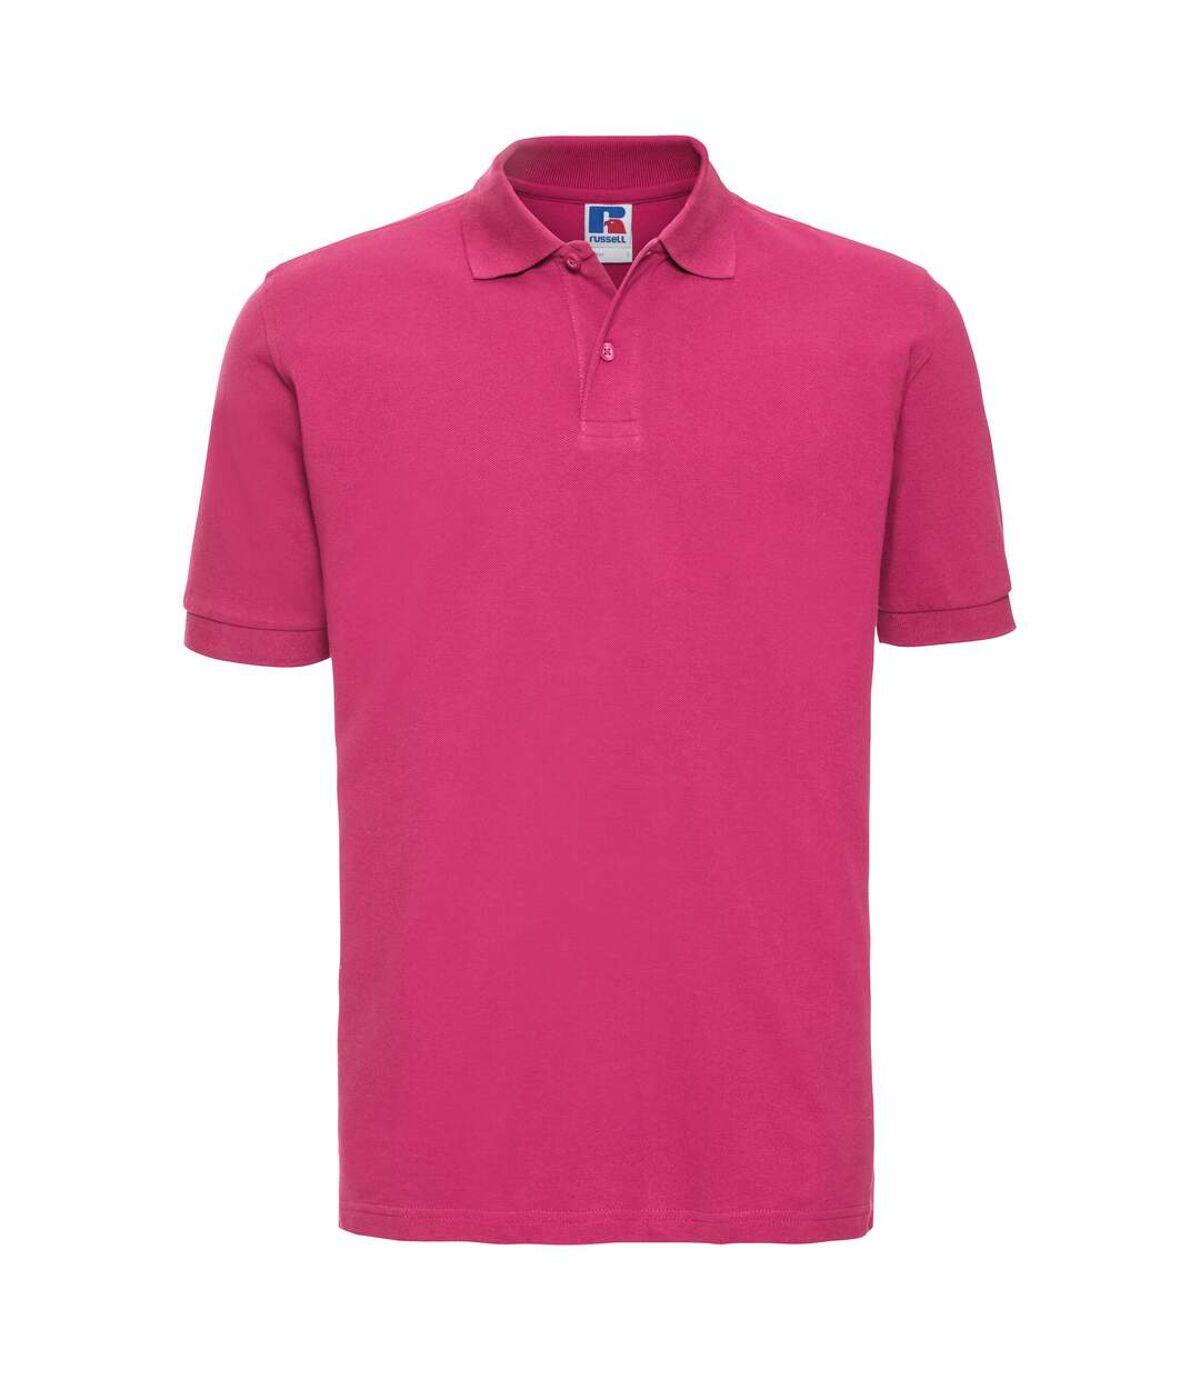 Russell Mens 100% Cotton Short Sleeve Polo Shirt (Fuchsia) - UTBC567